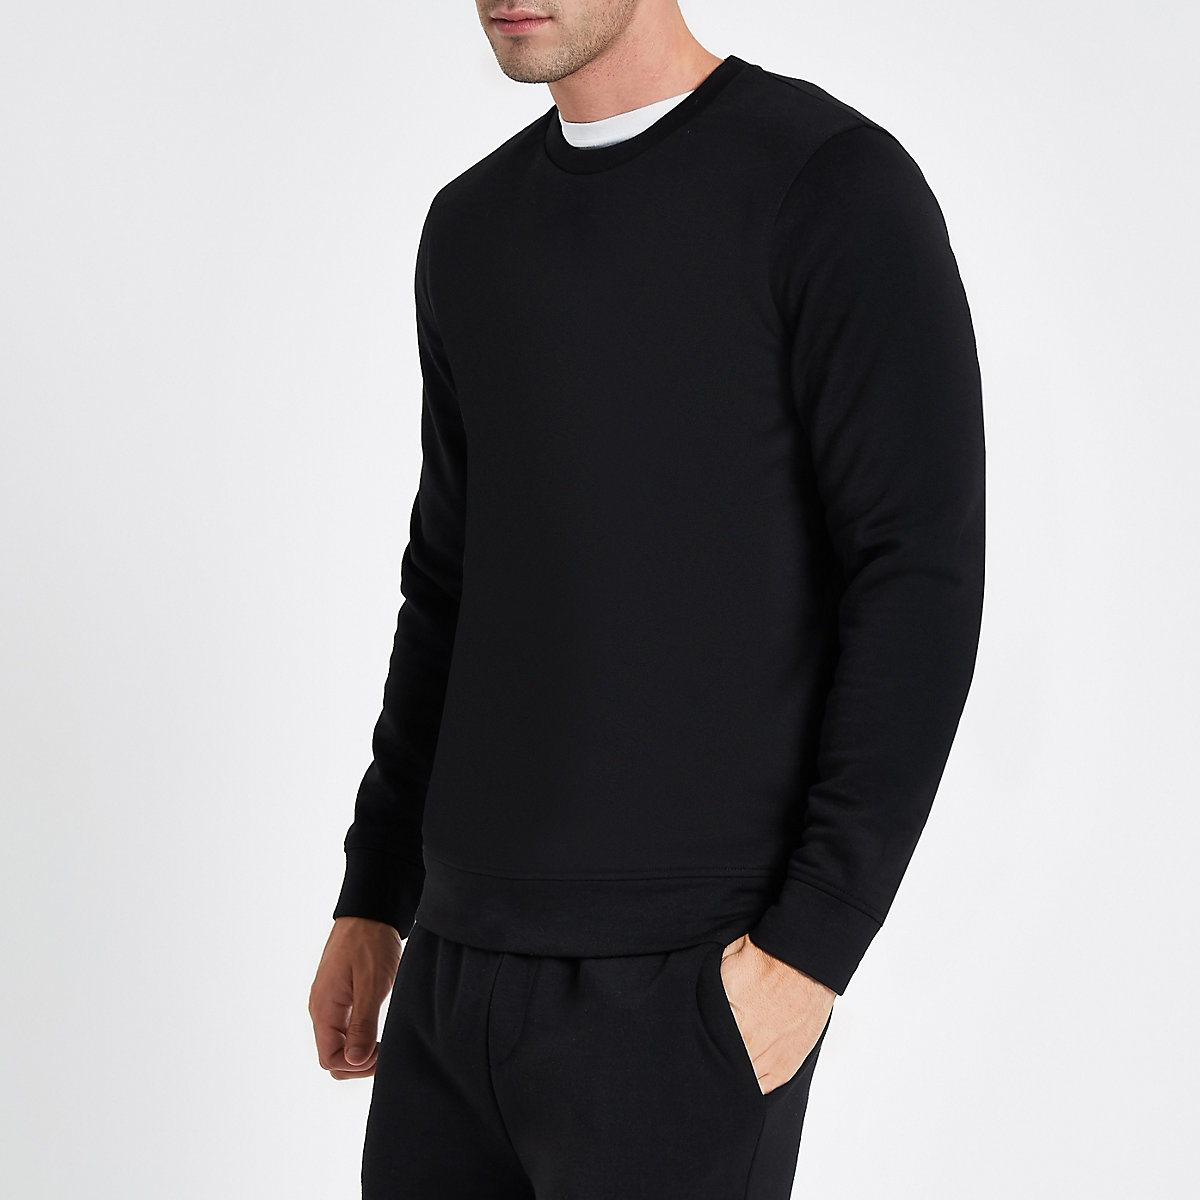 Black crew neck long sleeve sweatshirt